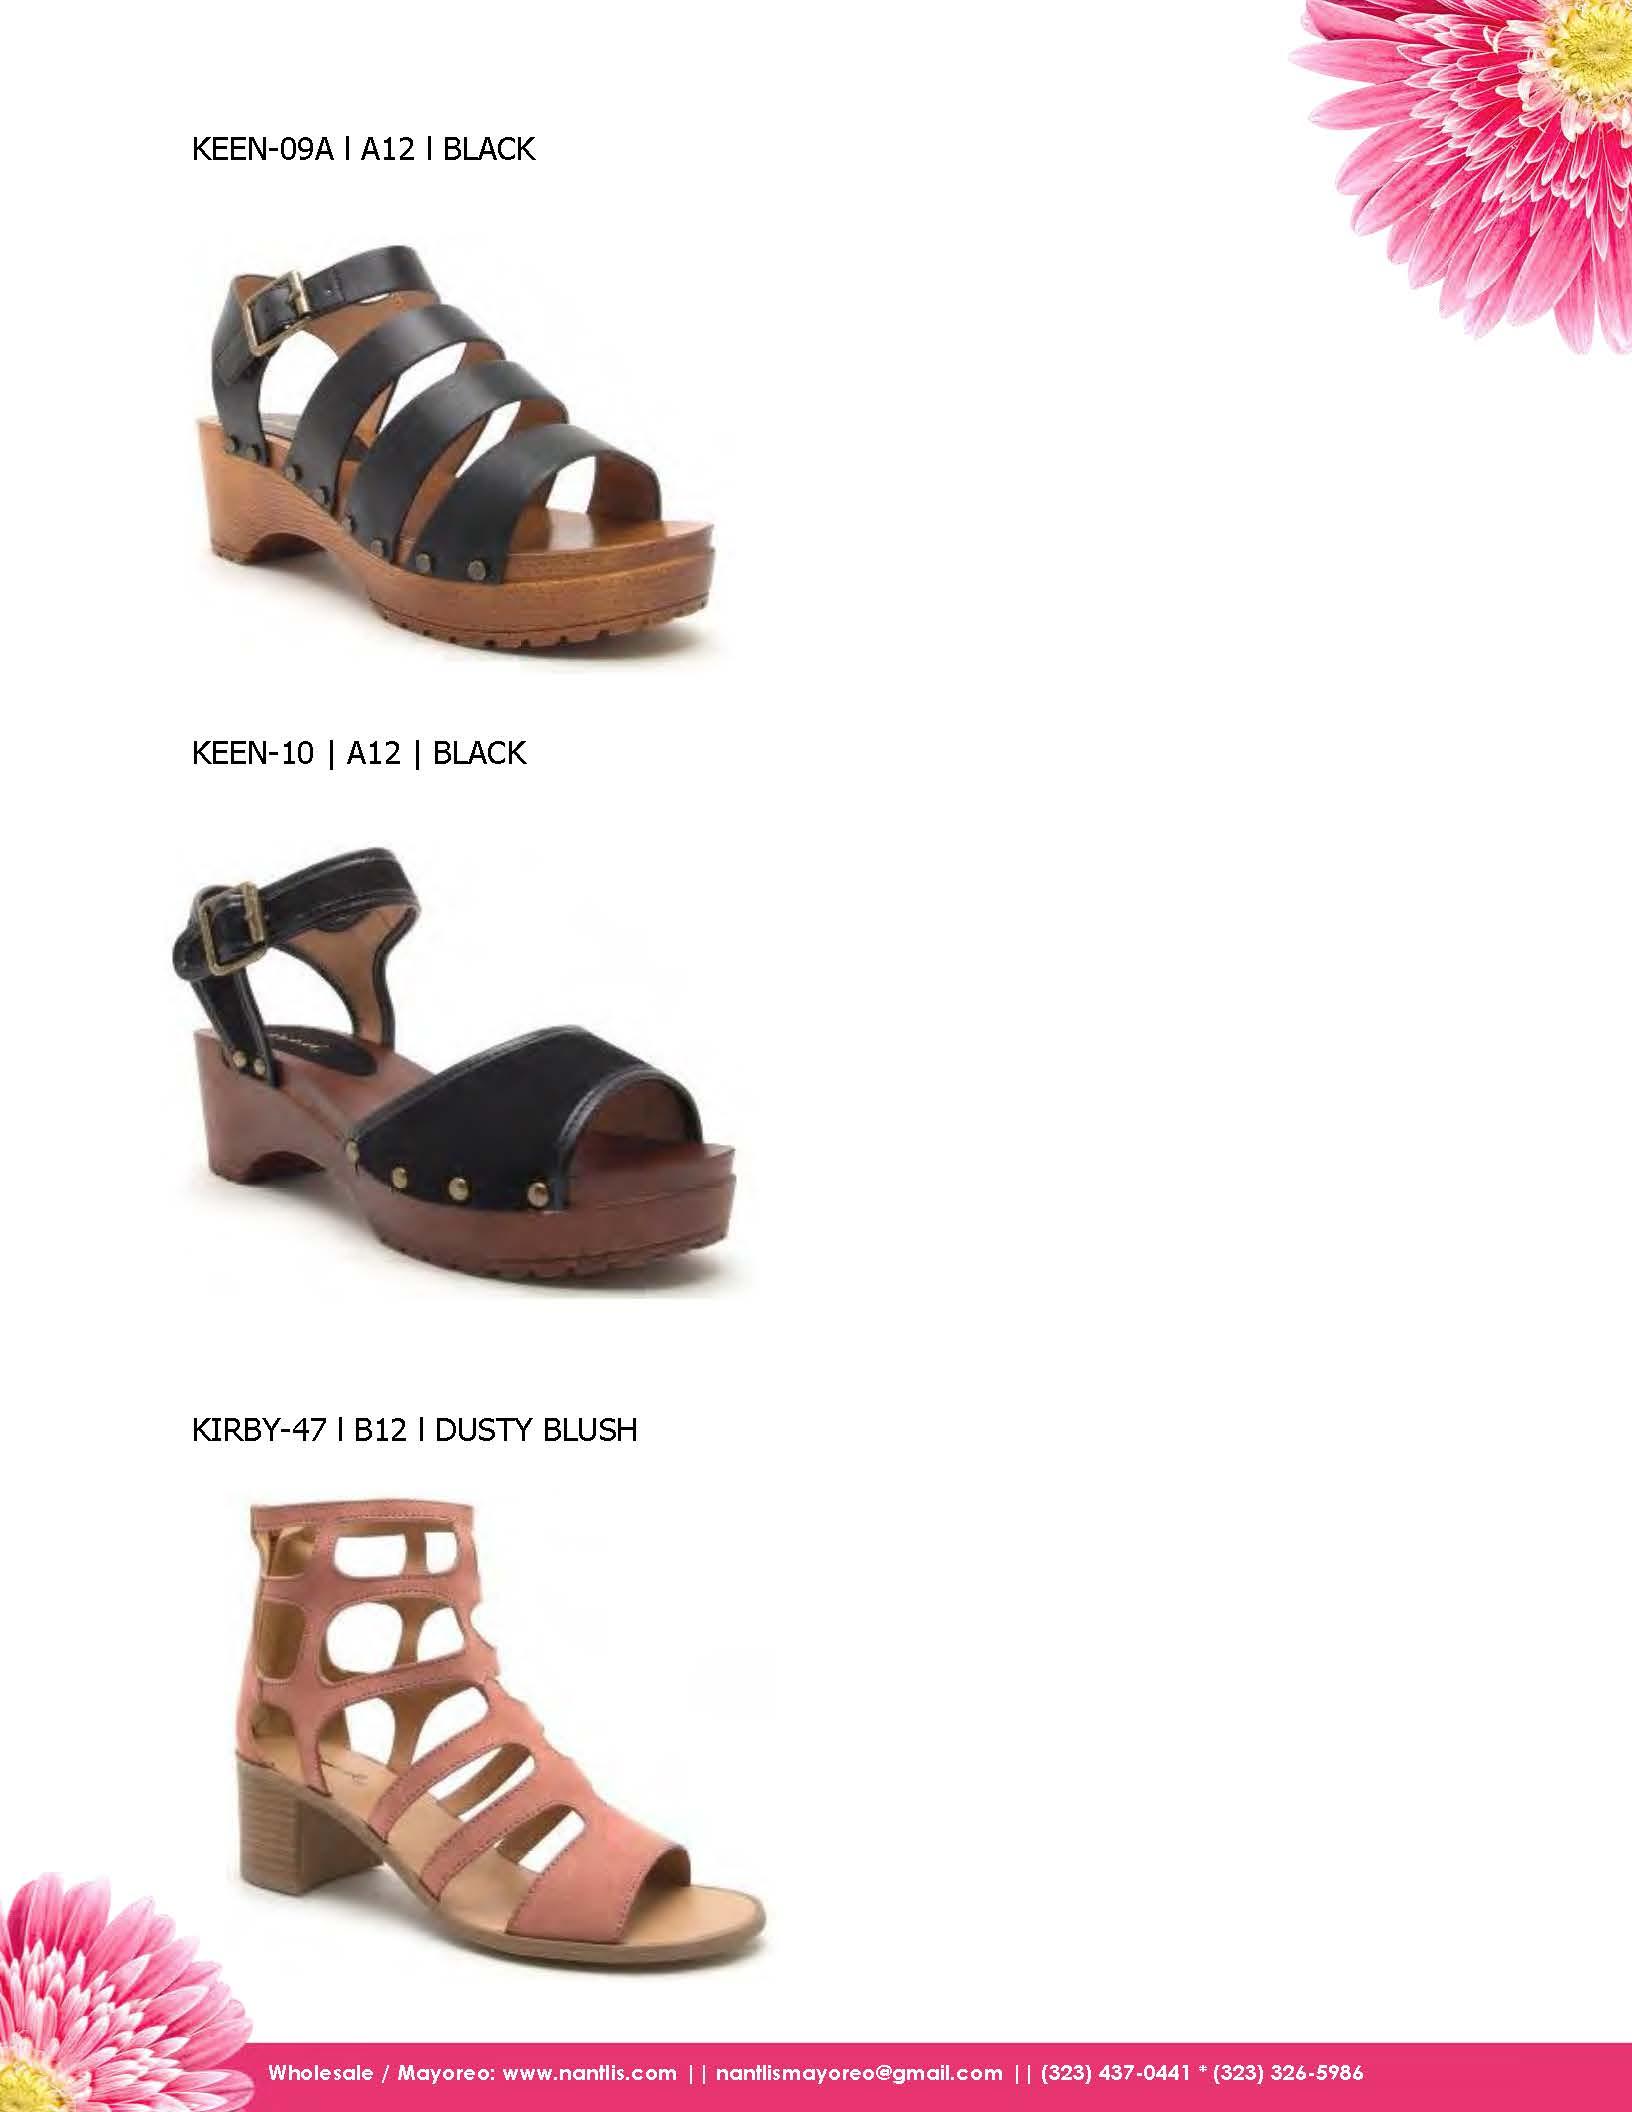 Nantlis Vol QU43 Zapatos para mujer mayoreo Wholesale shoes for women_Page_23